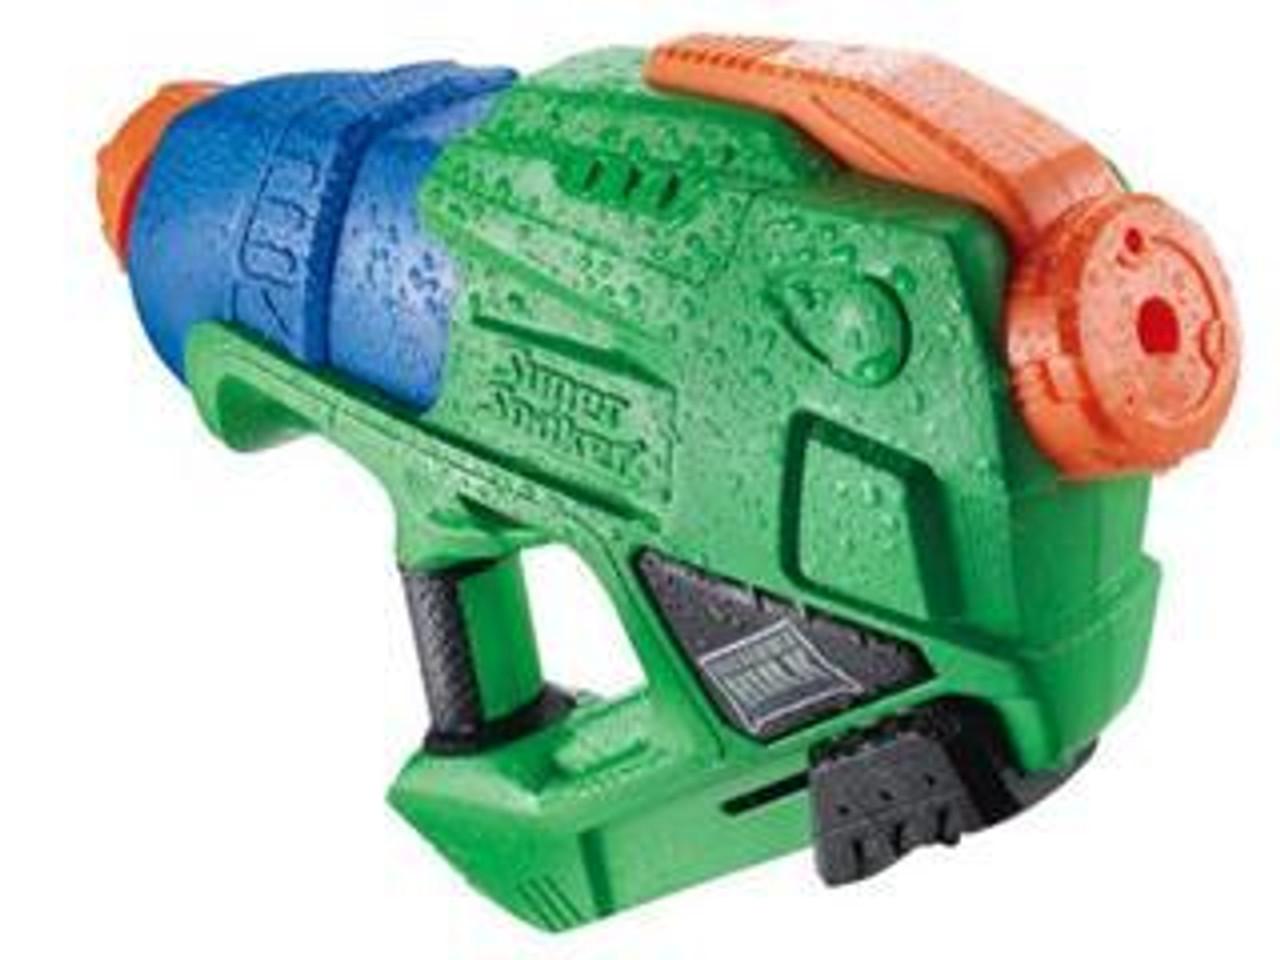 The Incredible Hulk Movie Hulk Gamma Strike Water Blaster Roleplay Toy